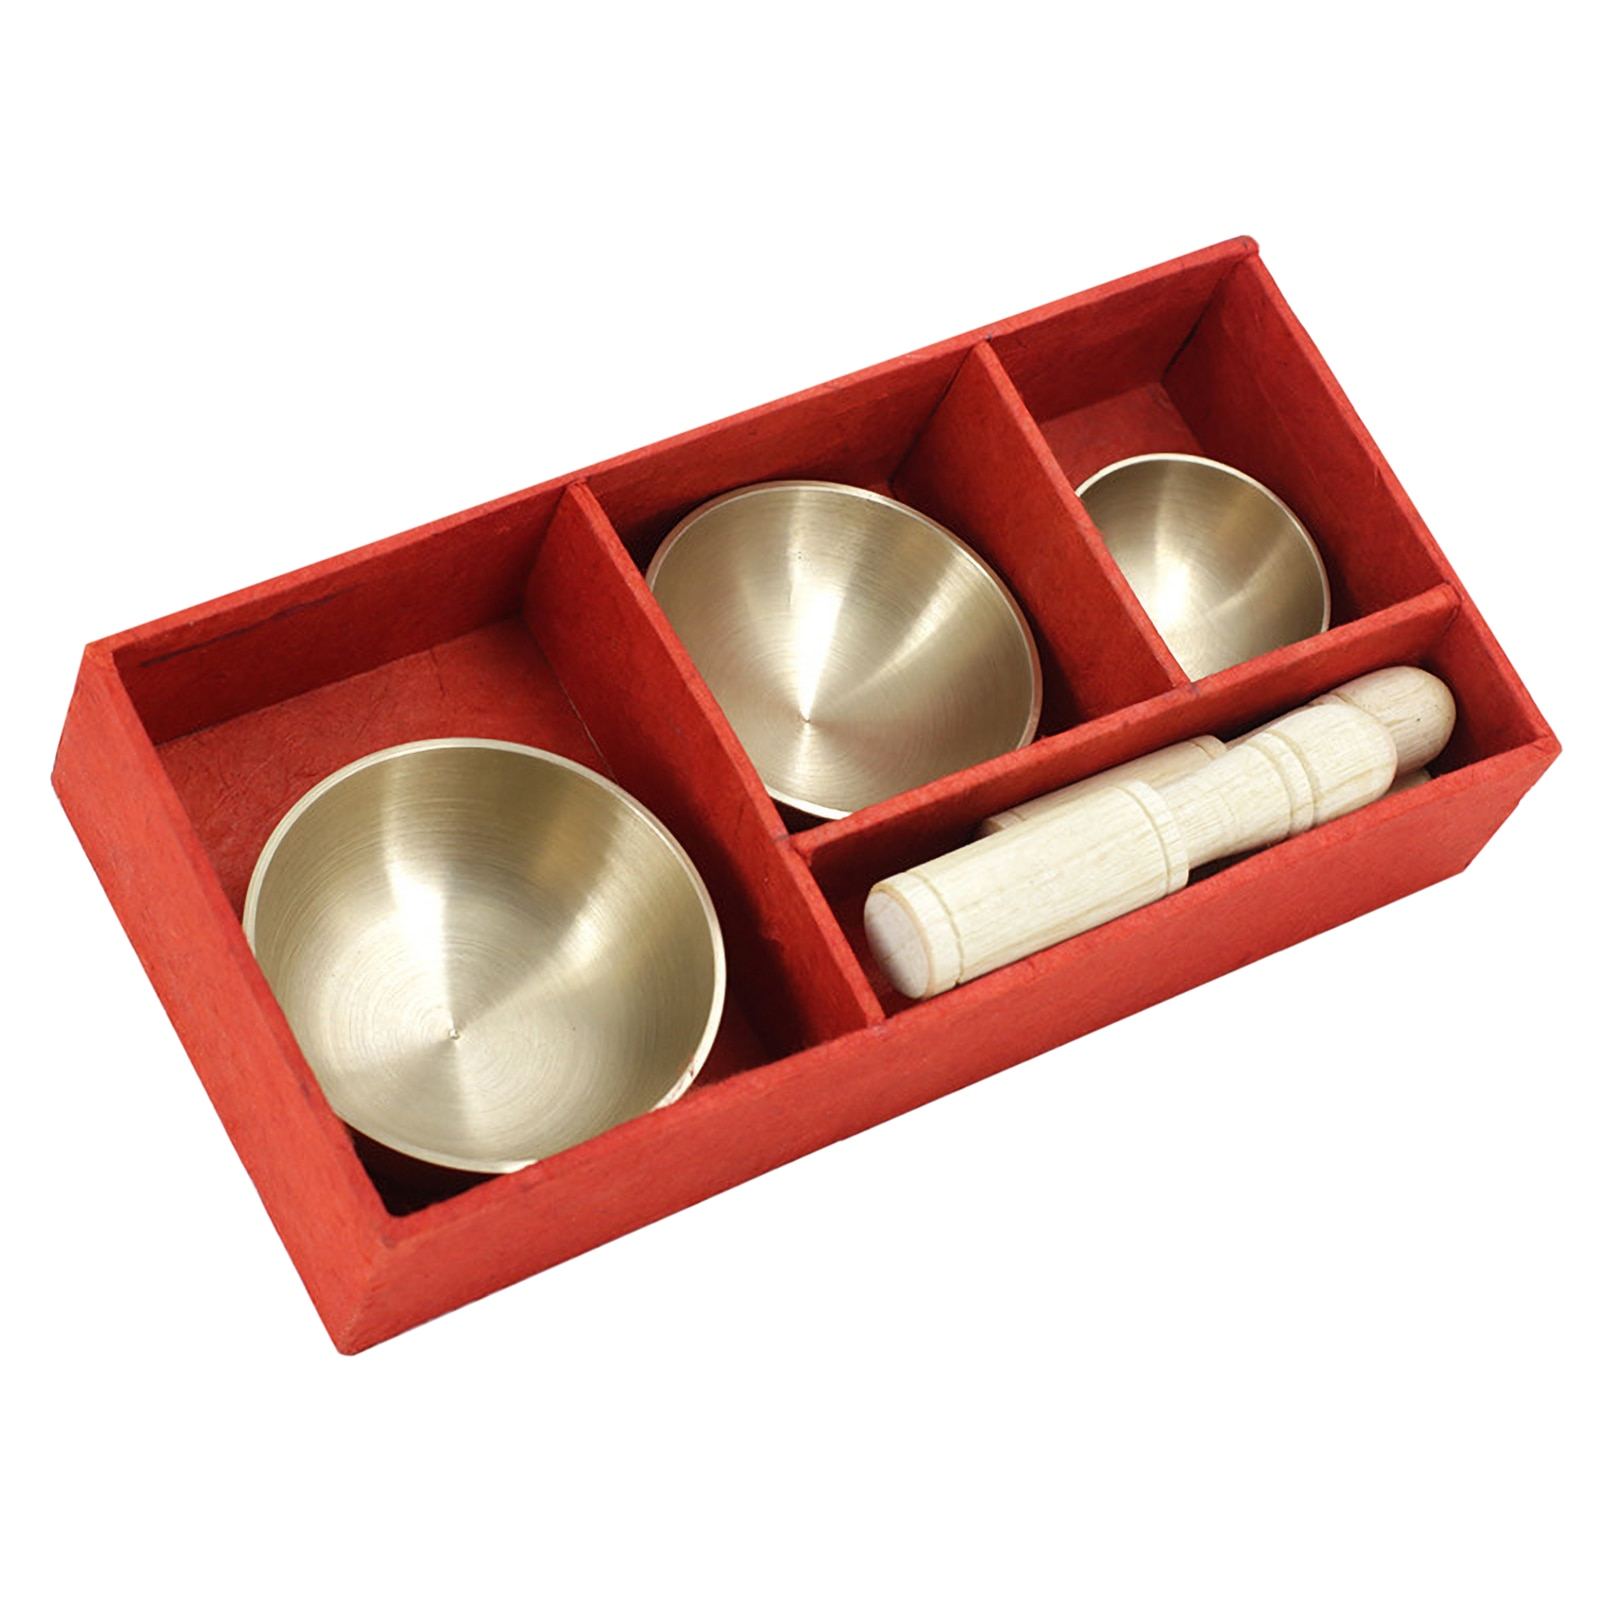 3pcs Bell Metal Singing Bowl Set 2 Mallets Mini Tibetan Singing Bowl Struck Bowl Buddhist Meditation Chanting Healing Relaxation enlarge